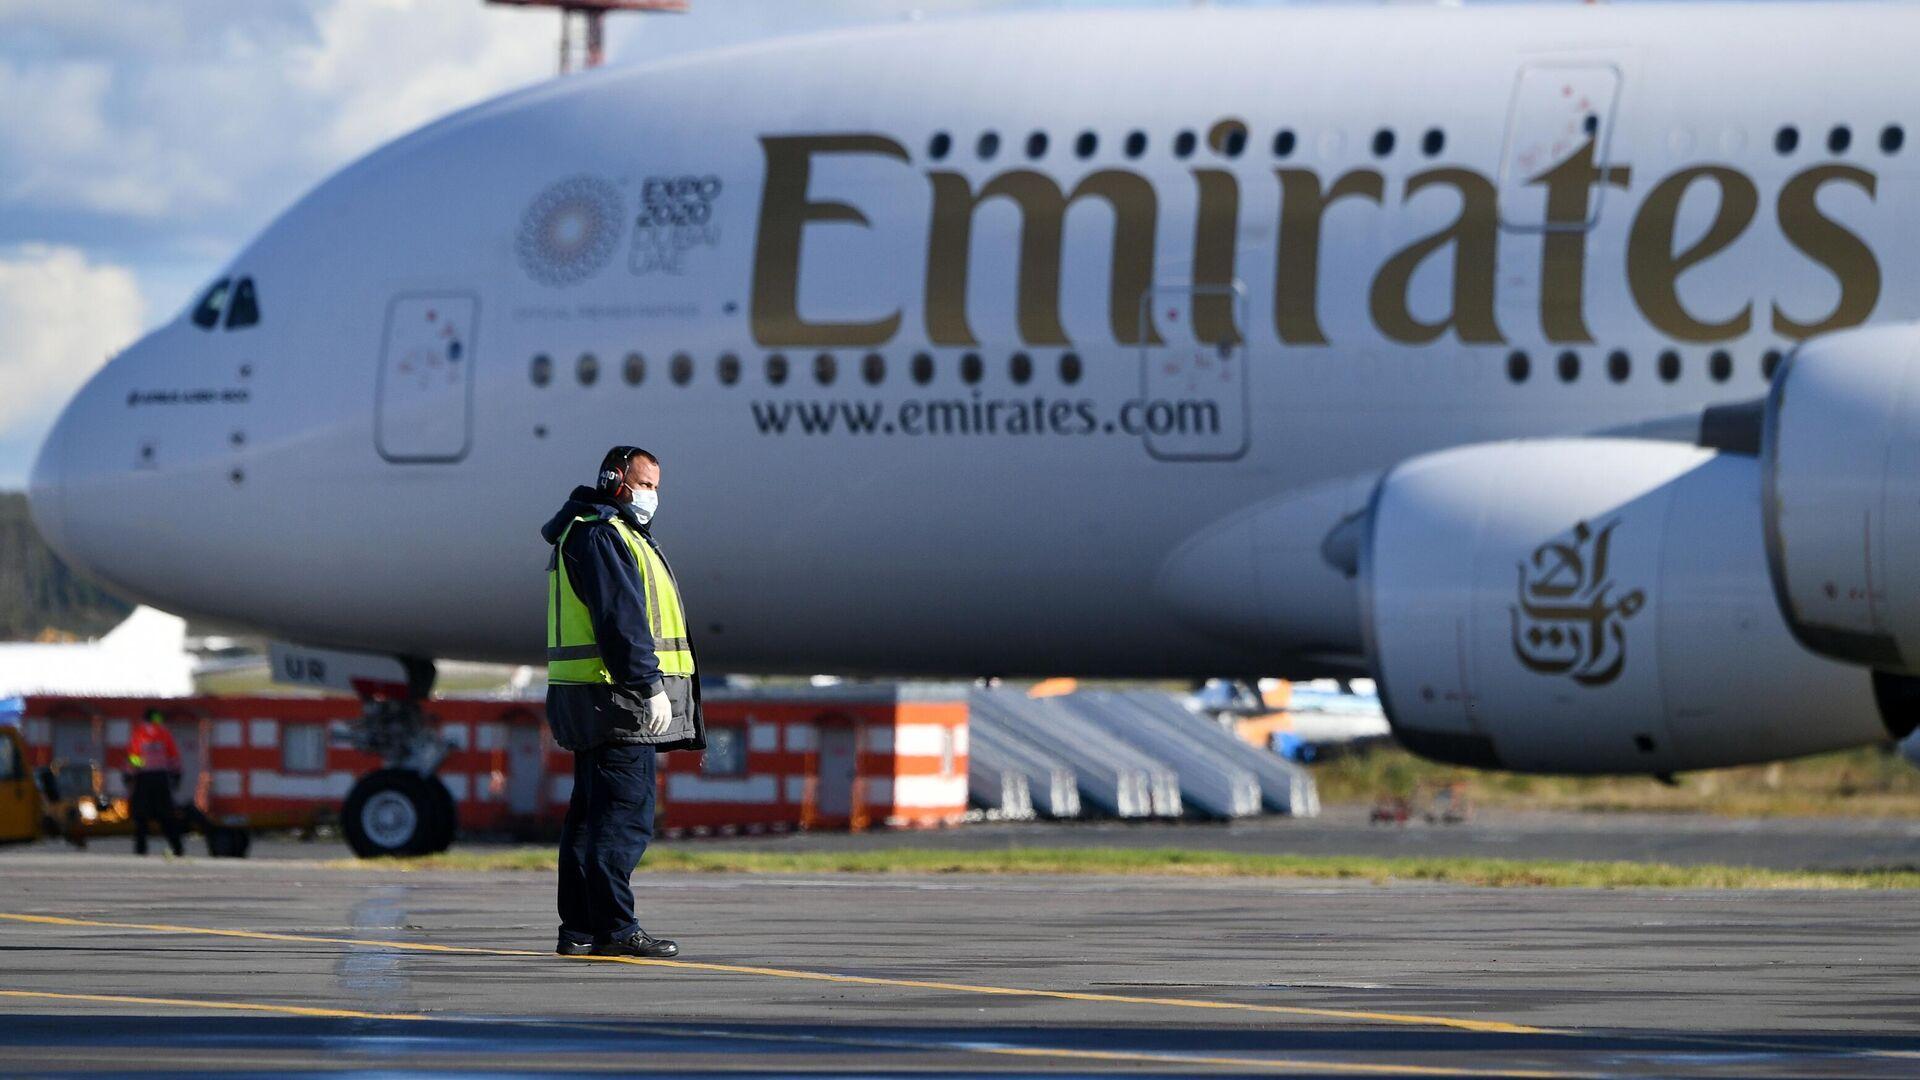 Сотрудник аэропорта около самолета Airbus A380 авиакомпании Emirates Airlines в аэропорту Домодедово - РИА Новости, 1920, 24.09.2020